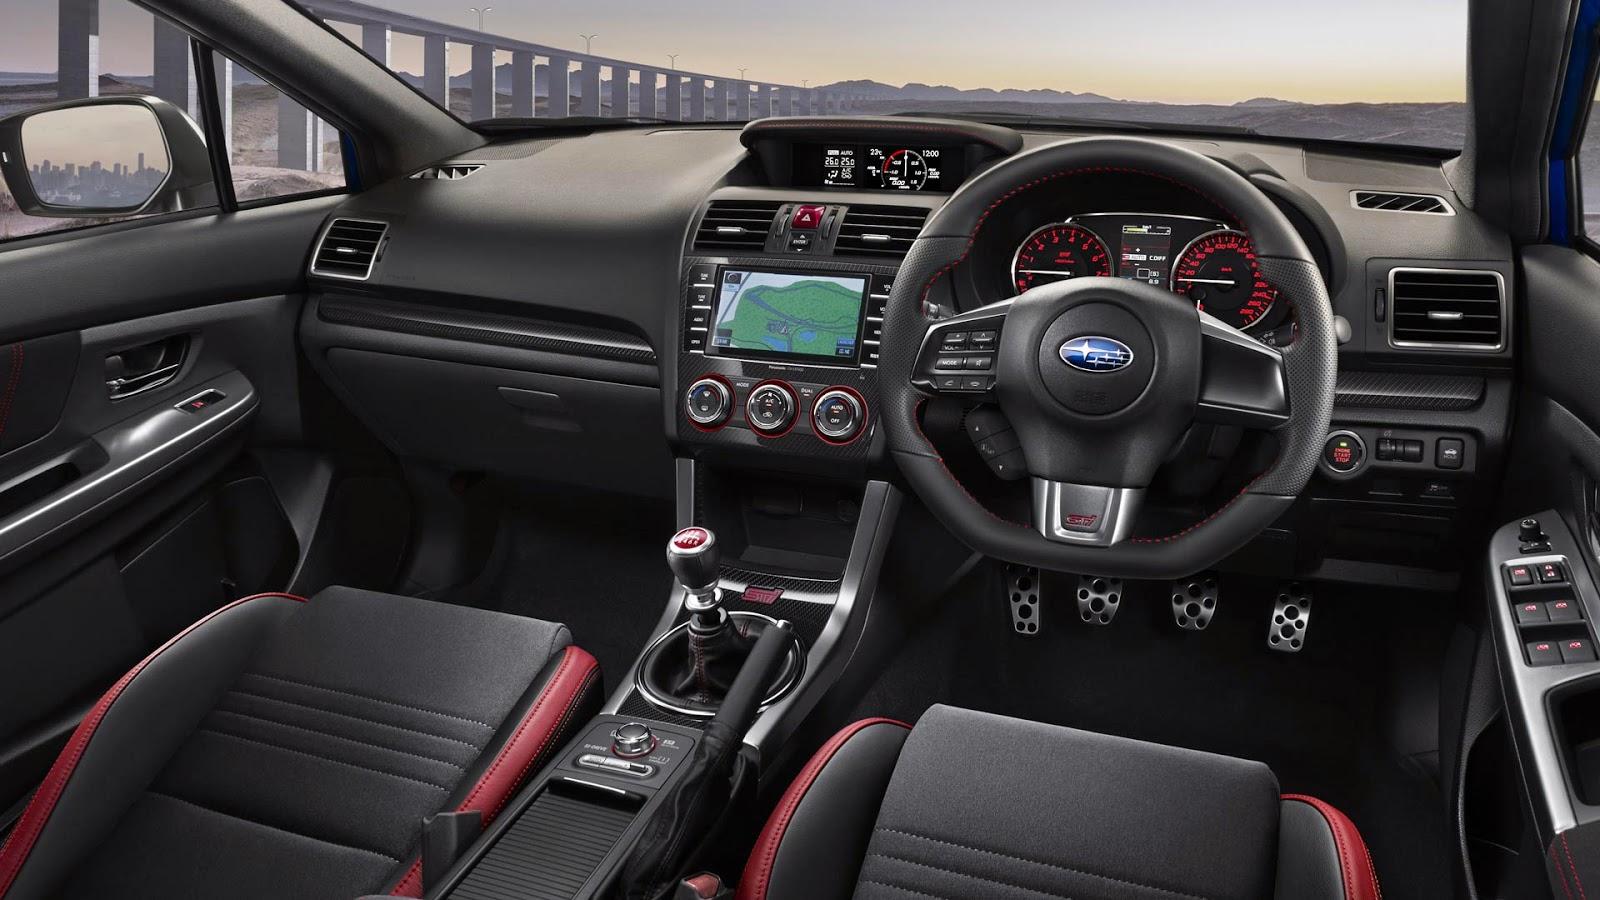 Leopaul's blog: Subaru WRX S4 (VAG) and WRX STi (VAB)